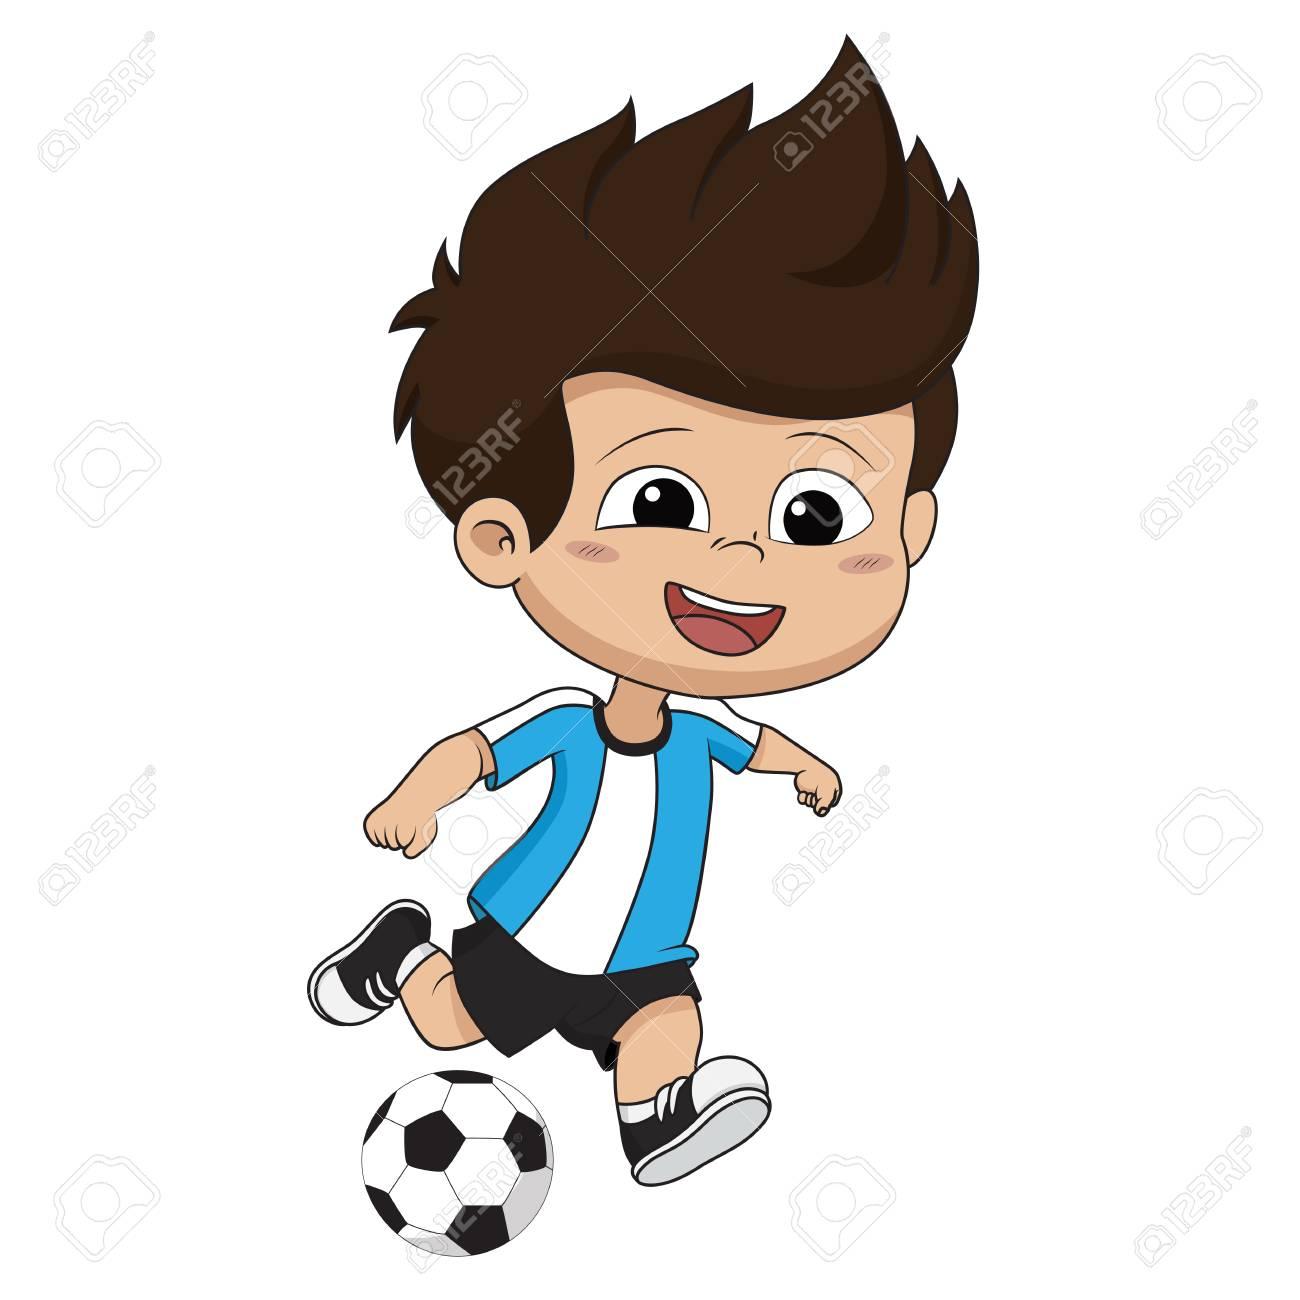 Kid kicks a ball.Vector and illustration. - 100914570